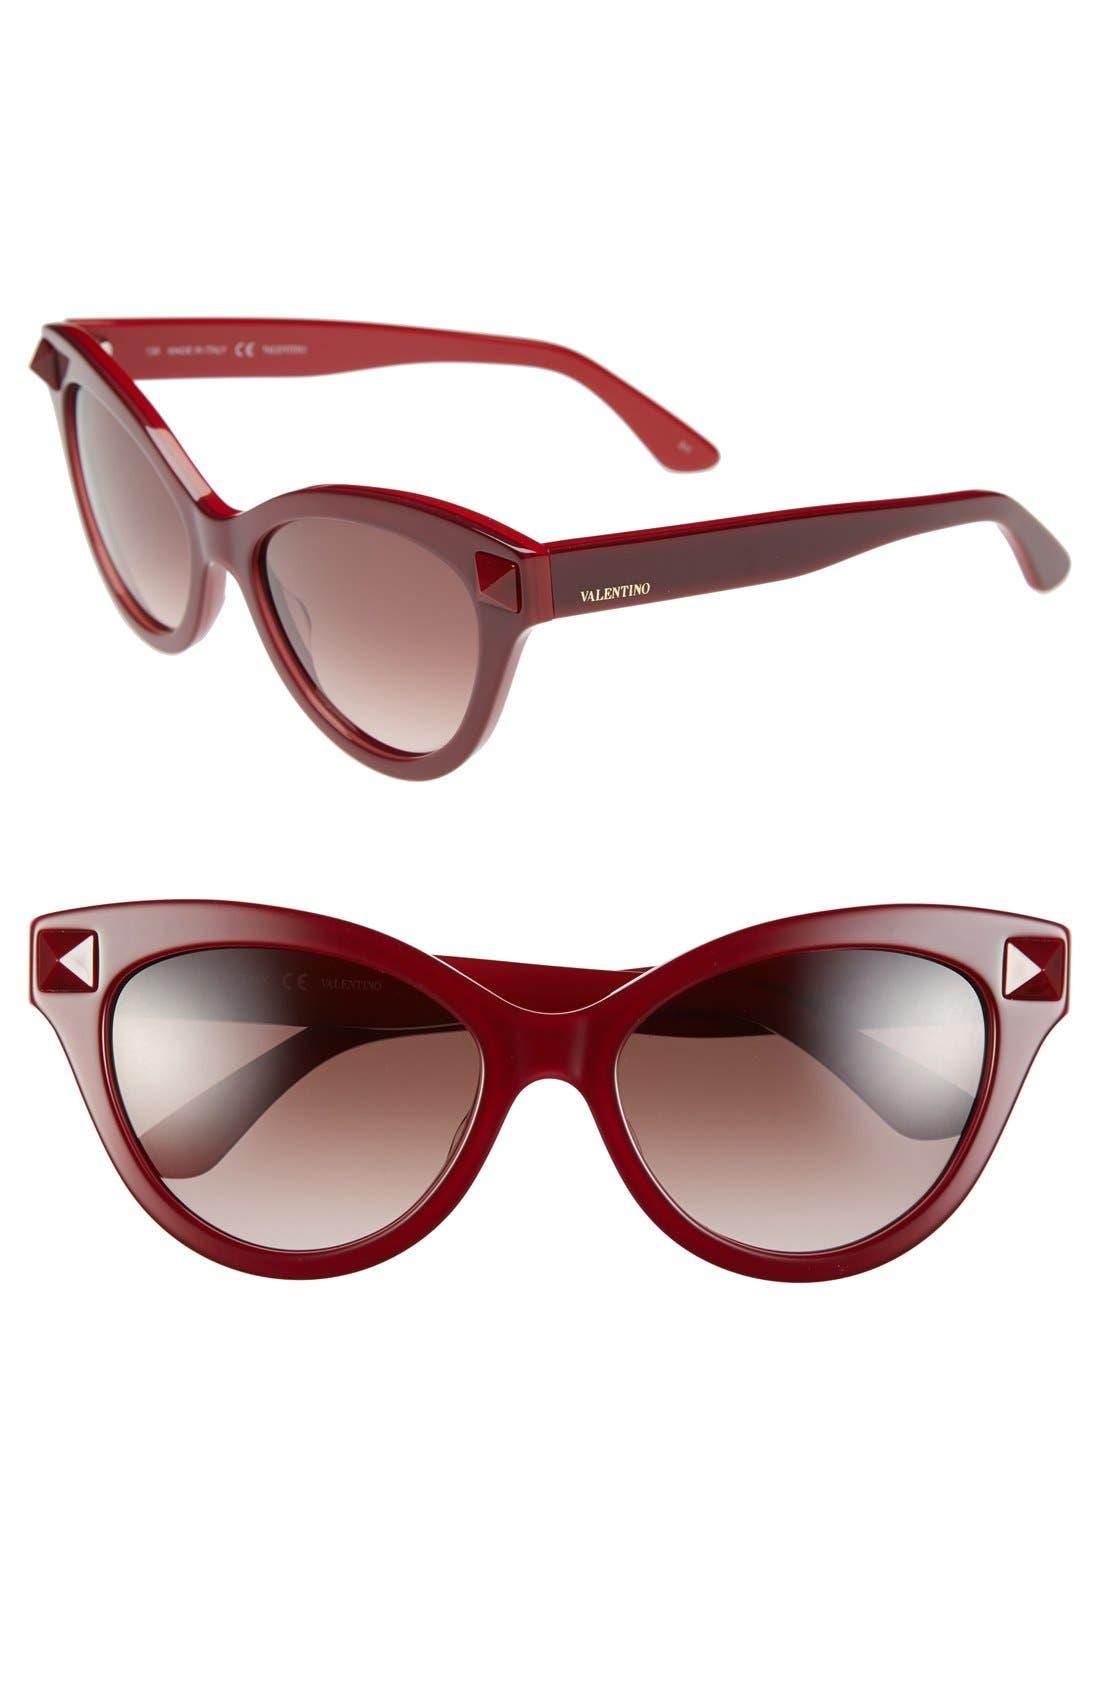 Alternate Image 1 Selected - Valentino 'Rockstud' 53mm Cat Eye Sunglasses